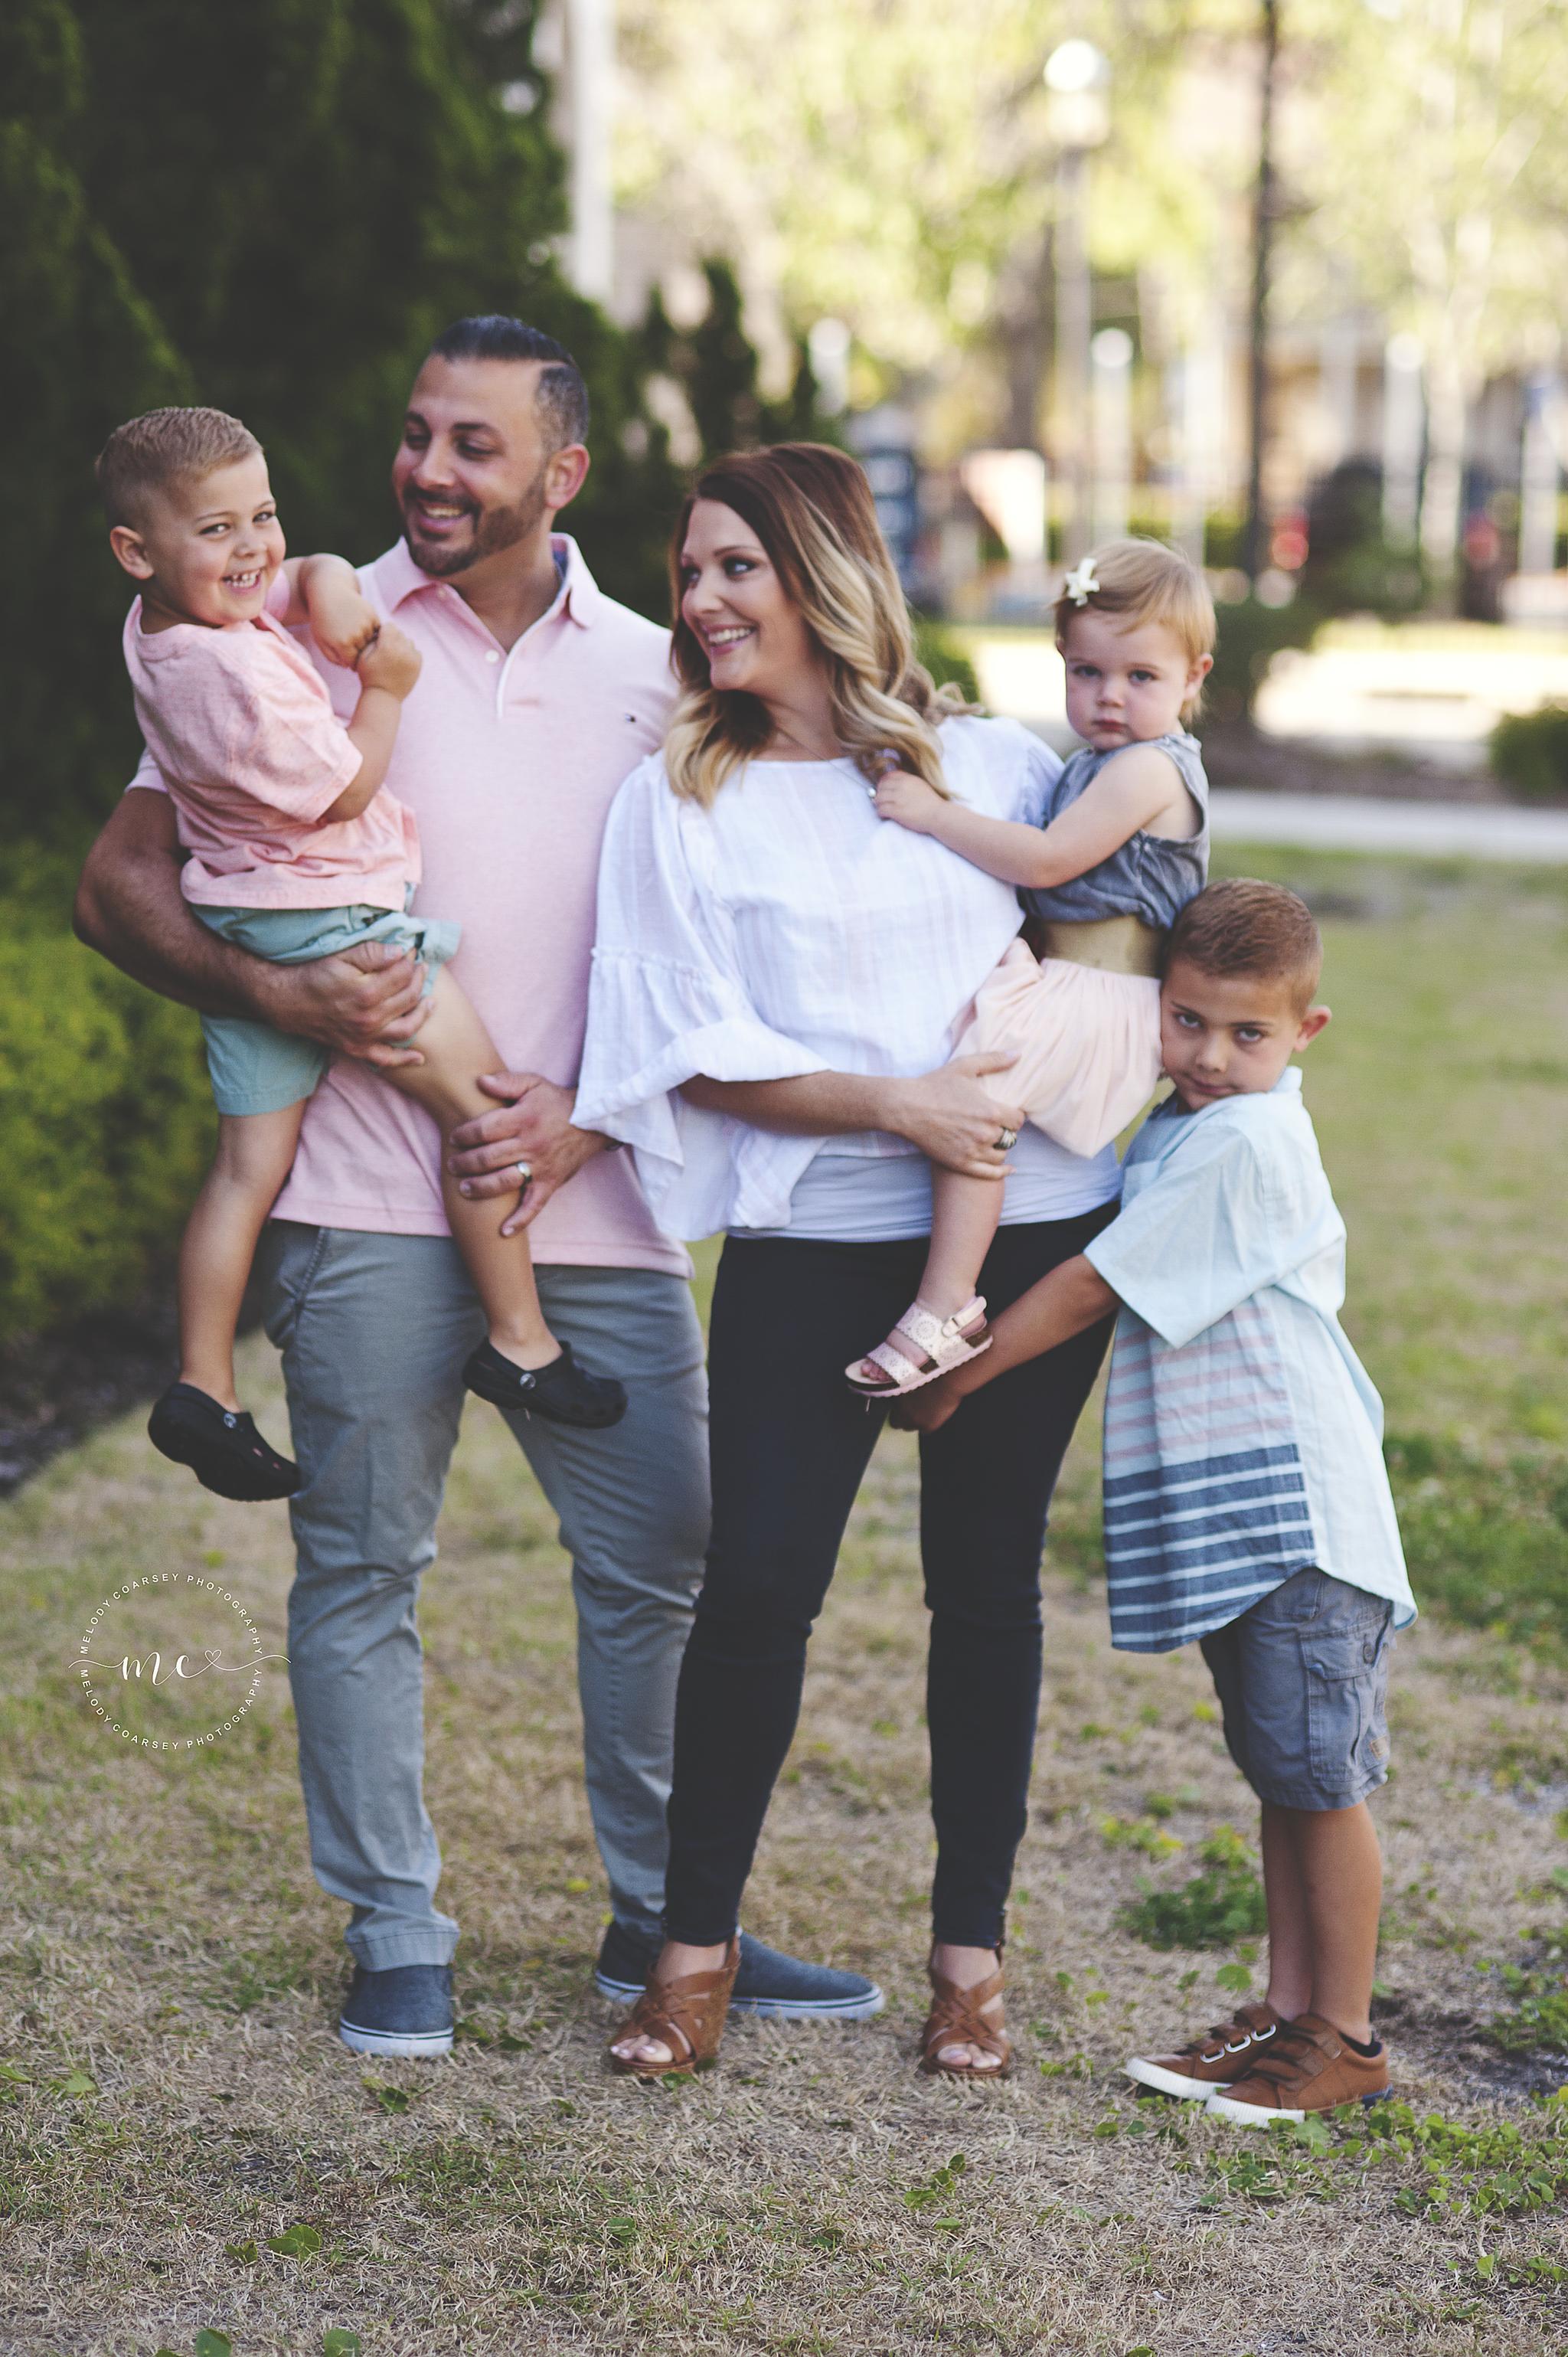 Blue And White Family Photos